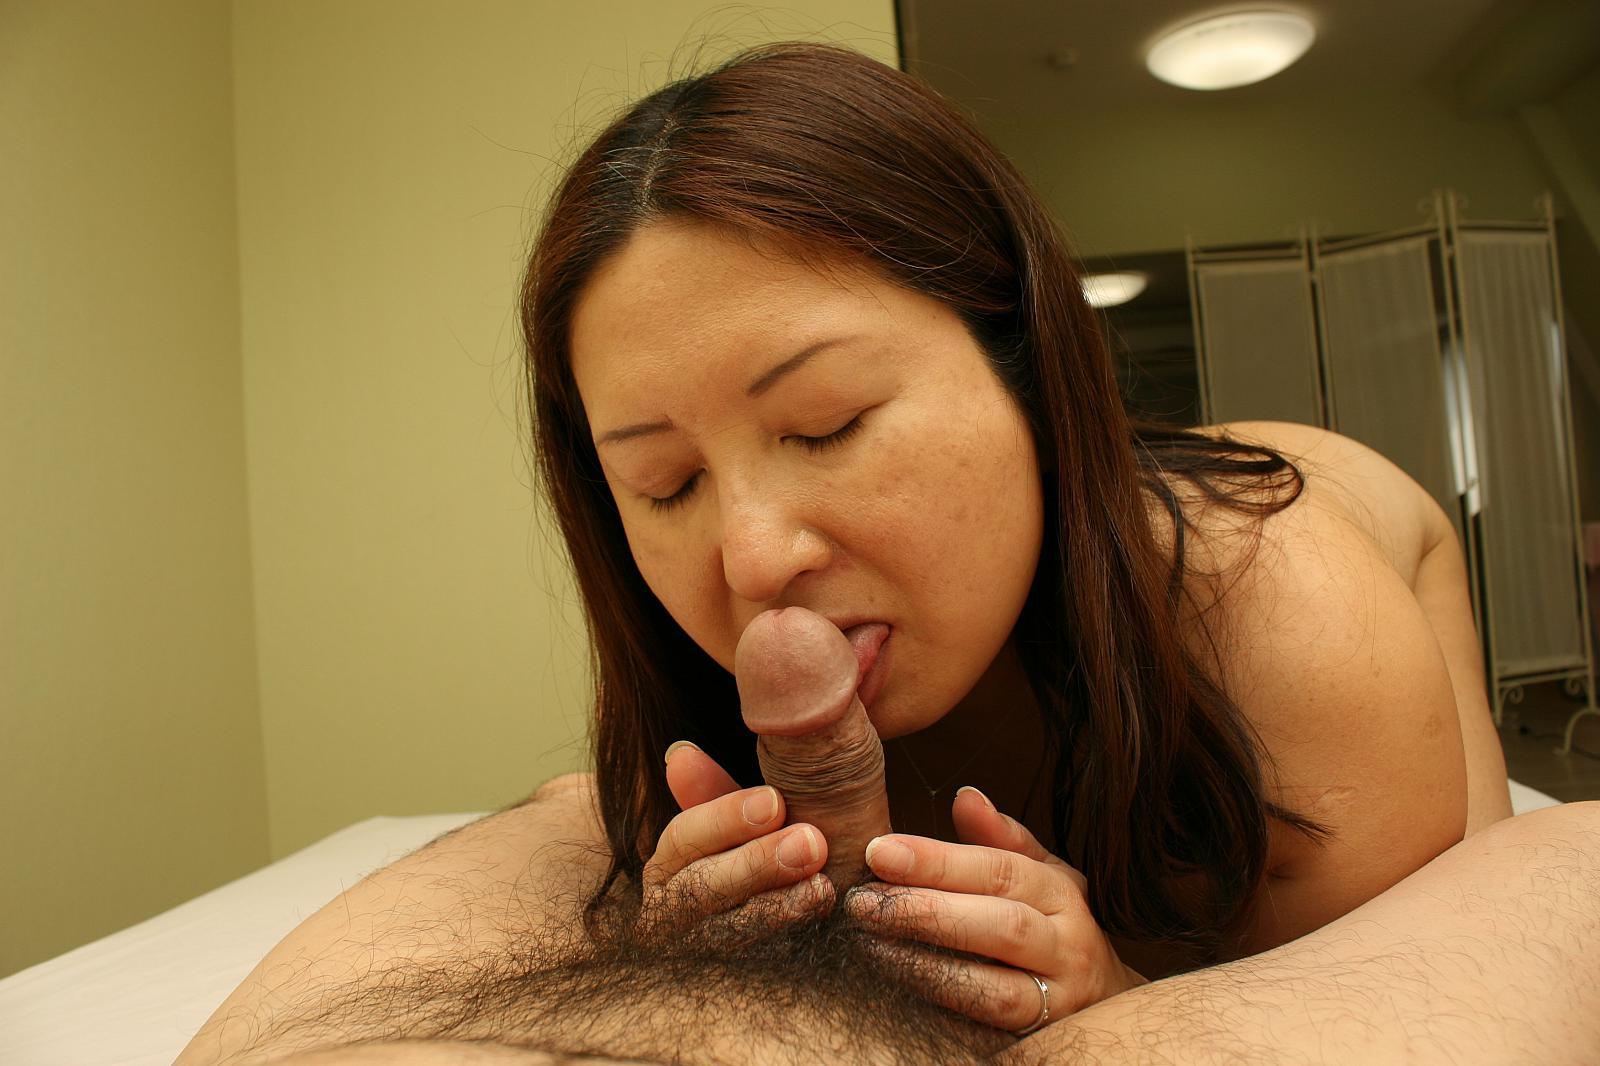 dildo solo japanese mom fuck son game show cock anal